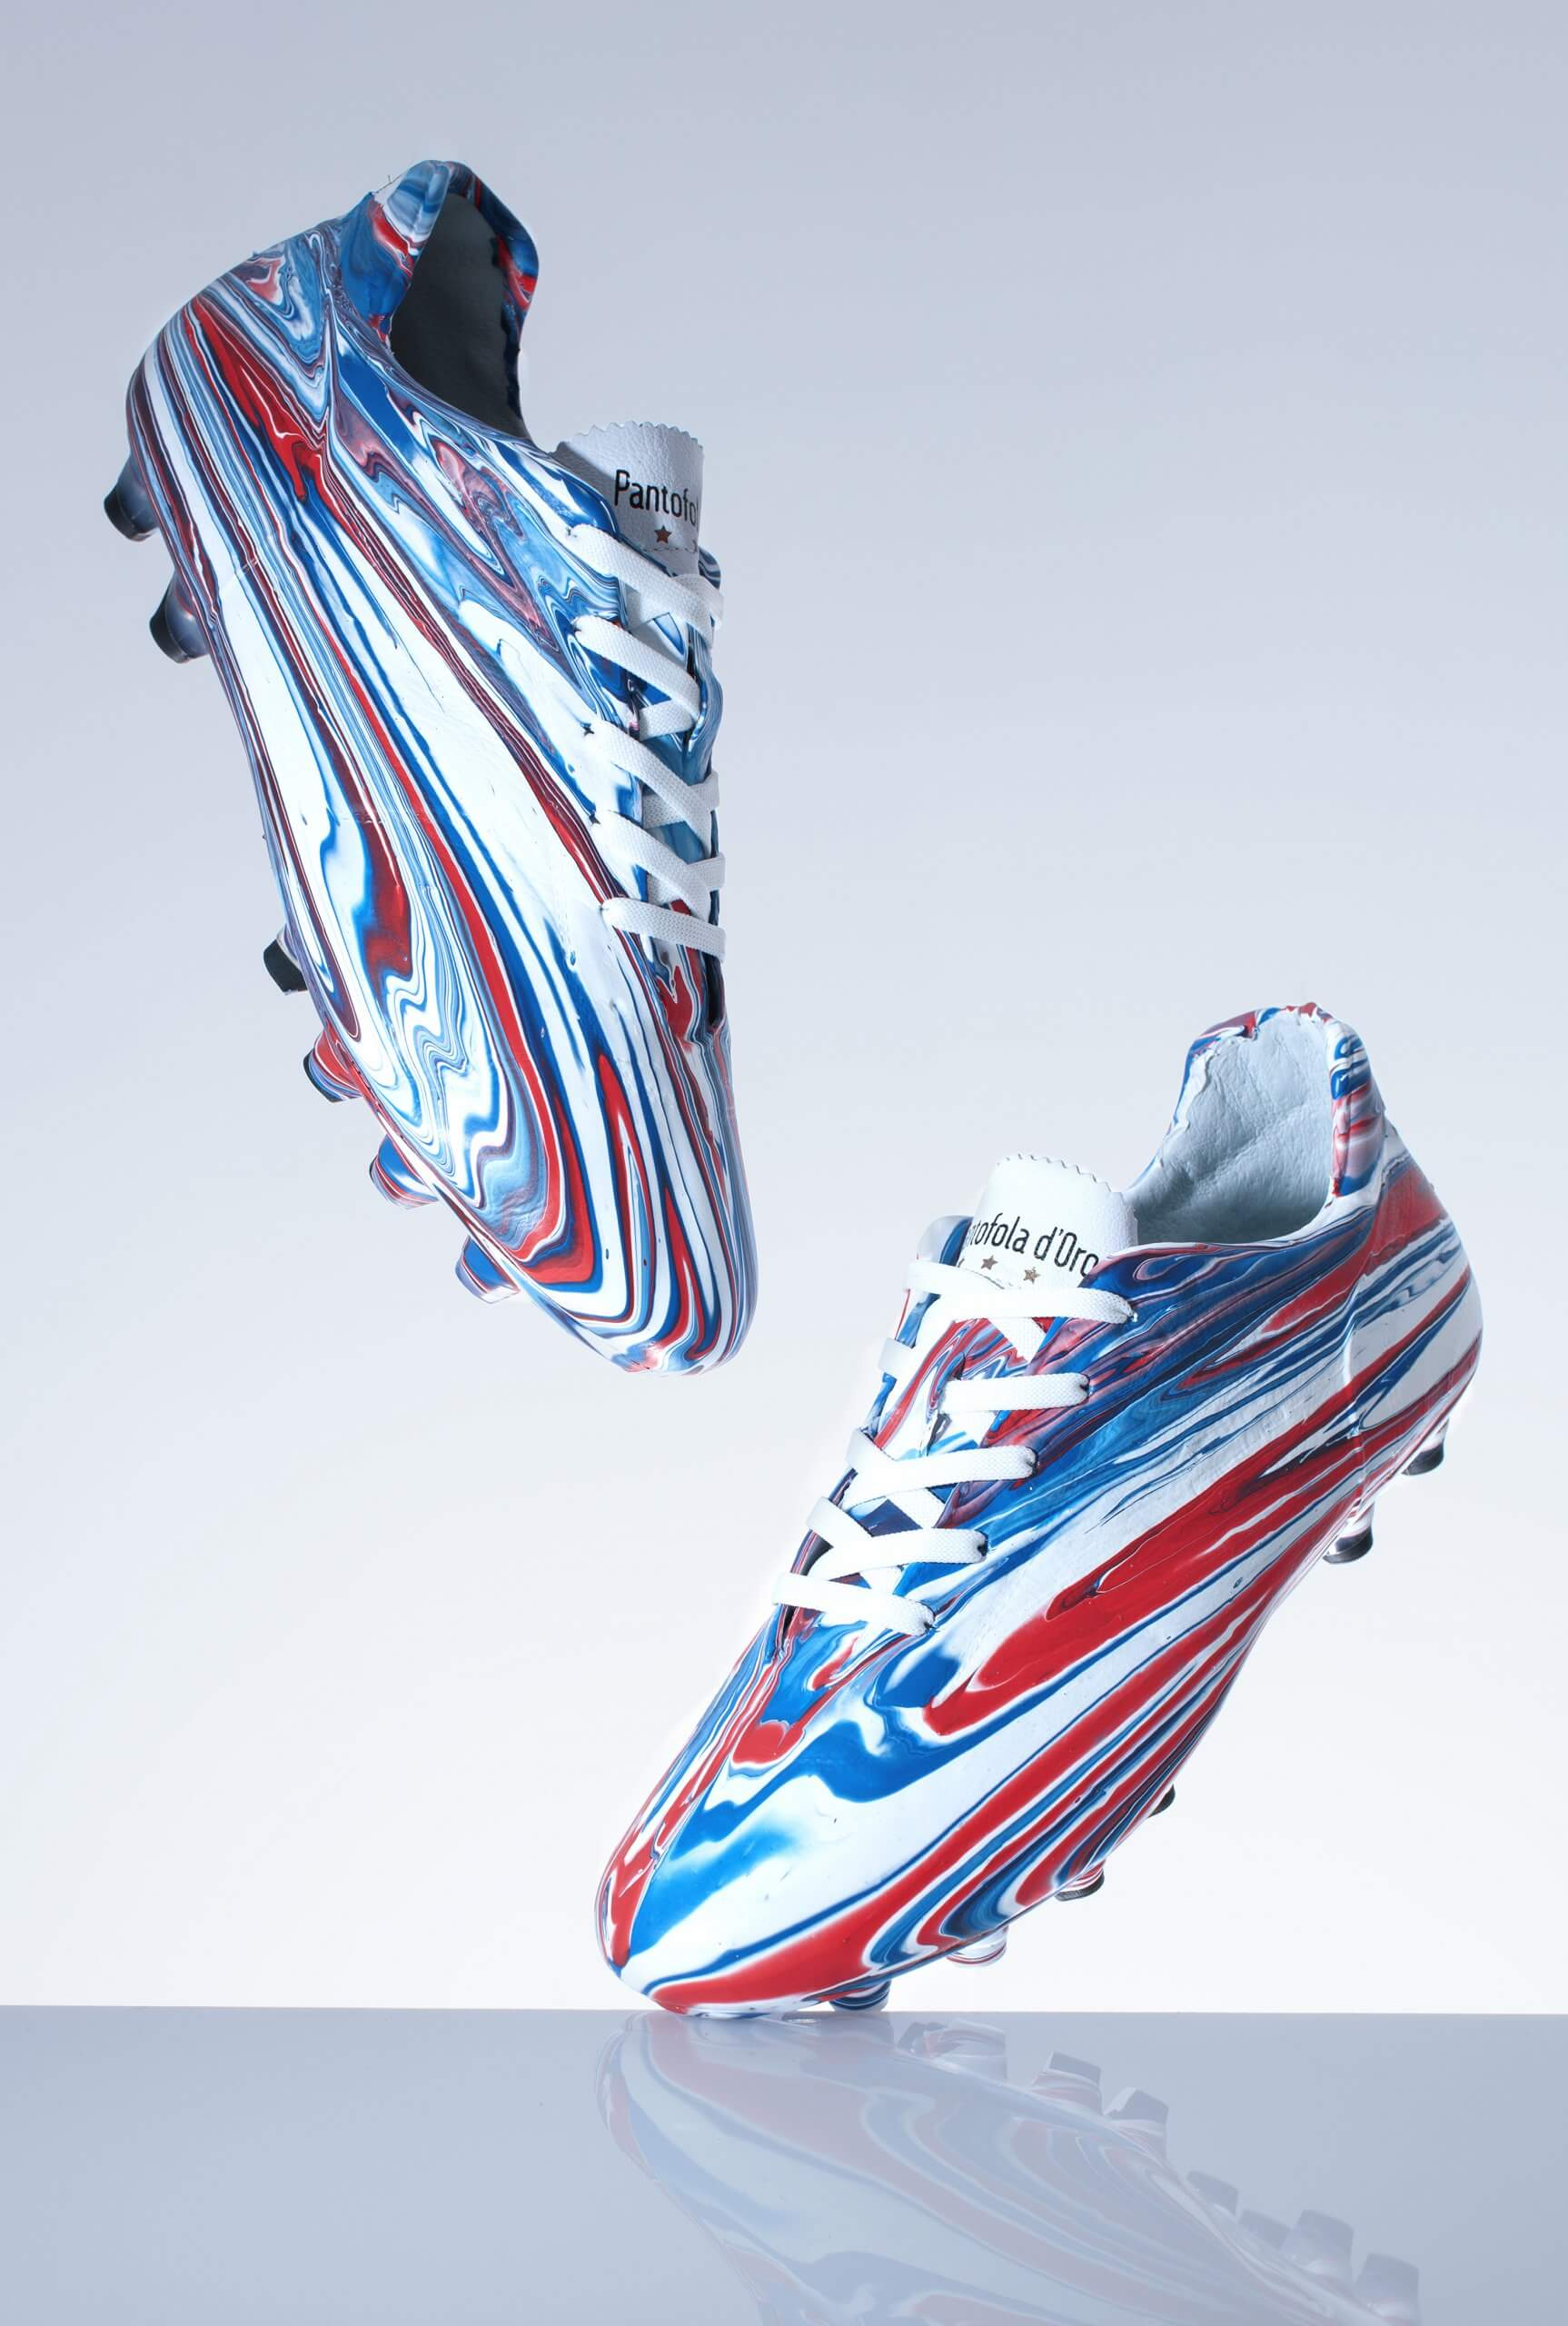 Craig Black x Pantofola d'Oro_Steven Gerrard x Rangers Football